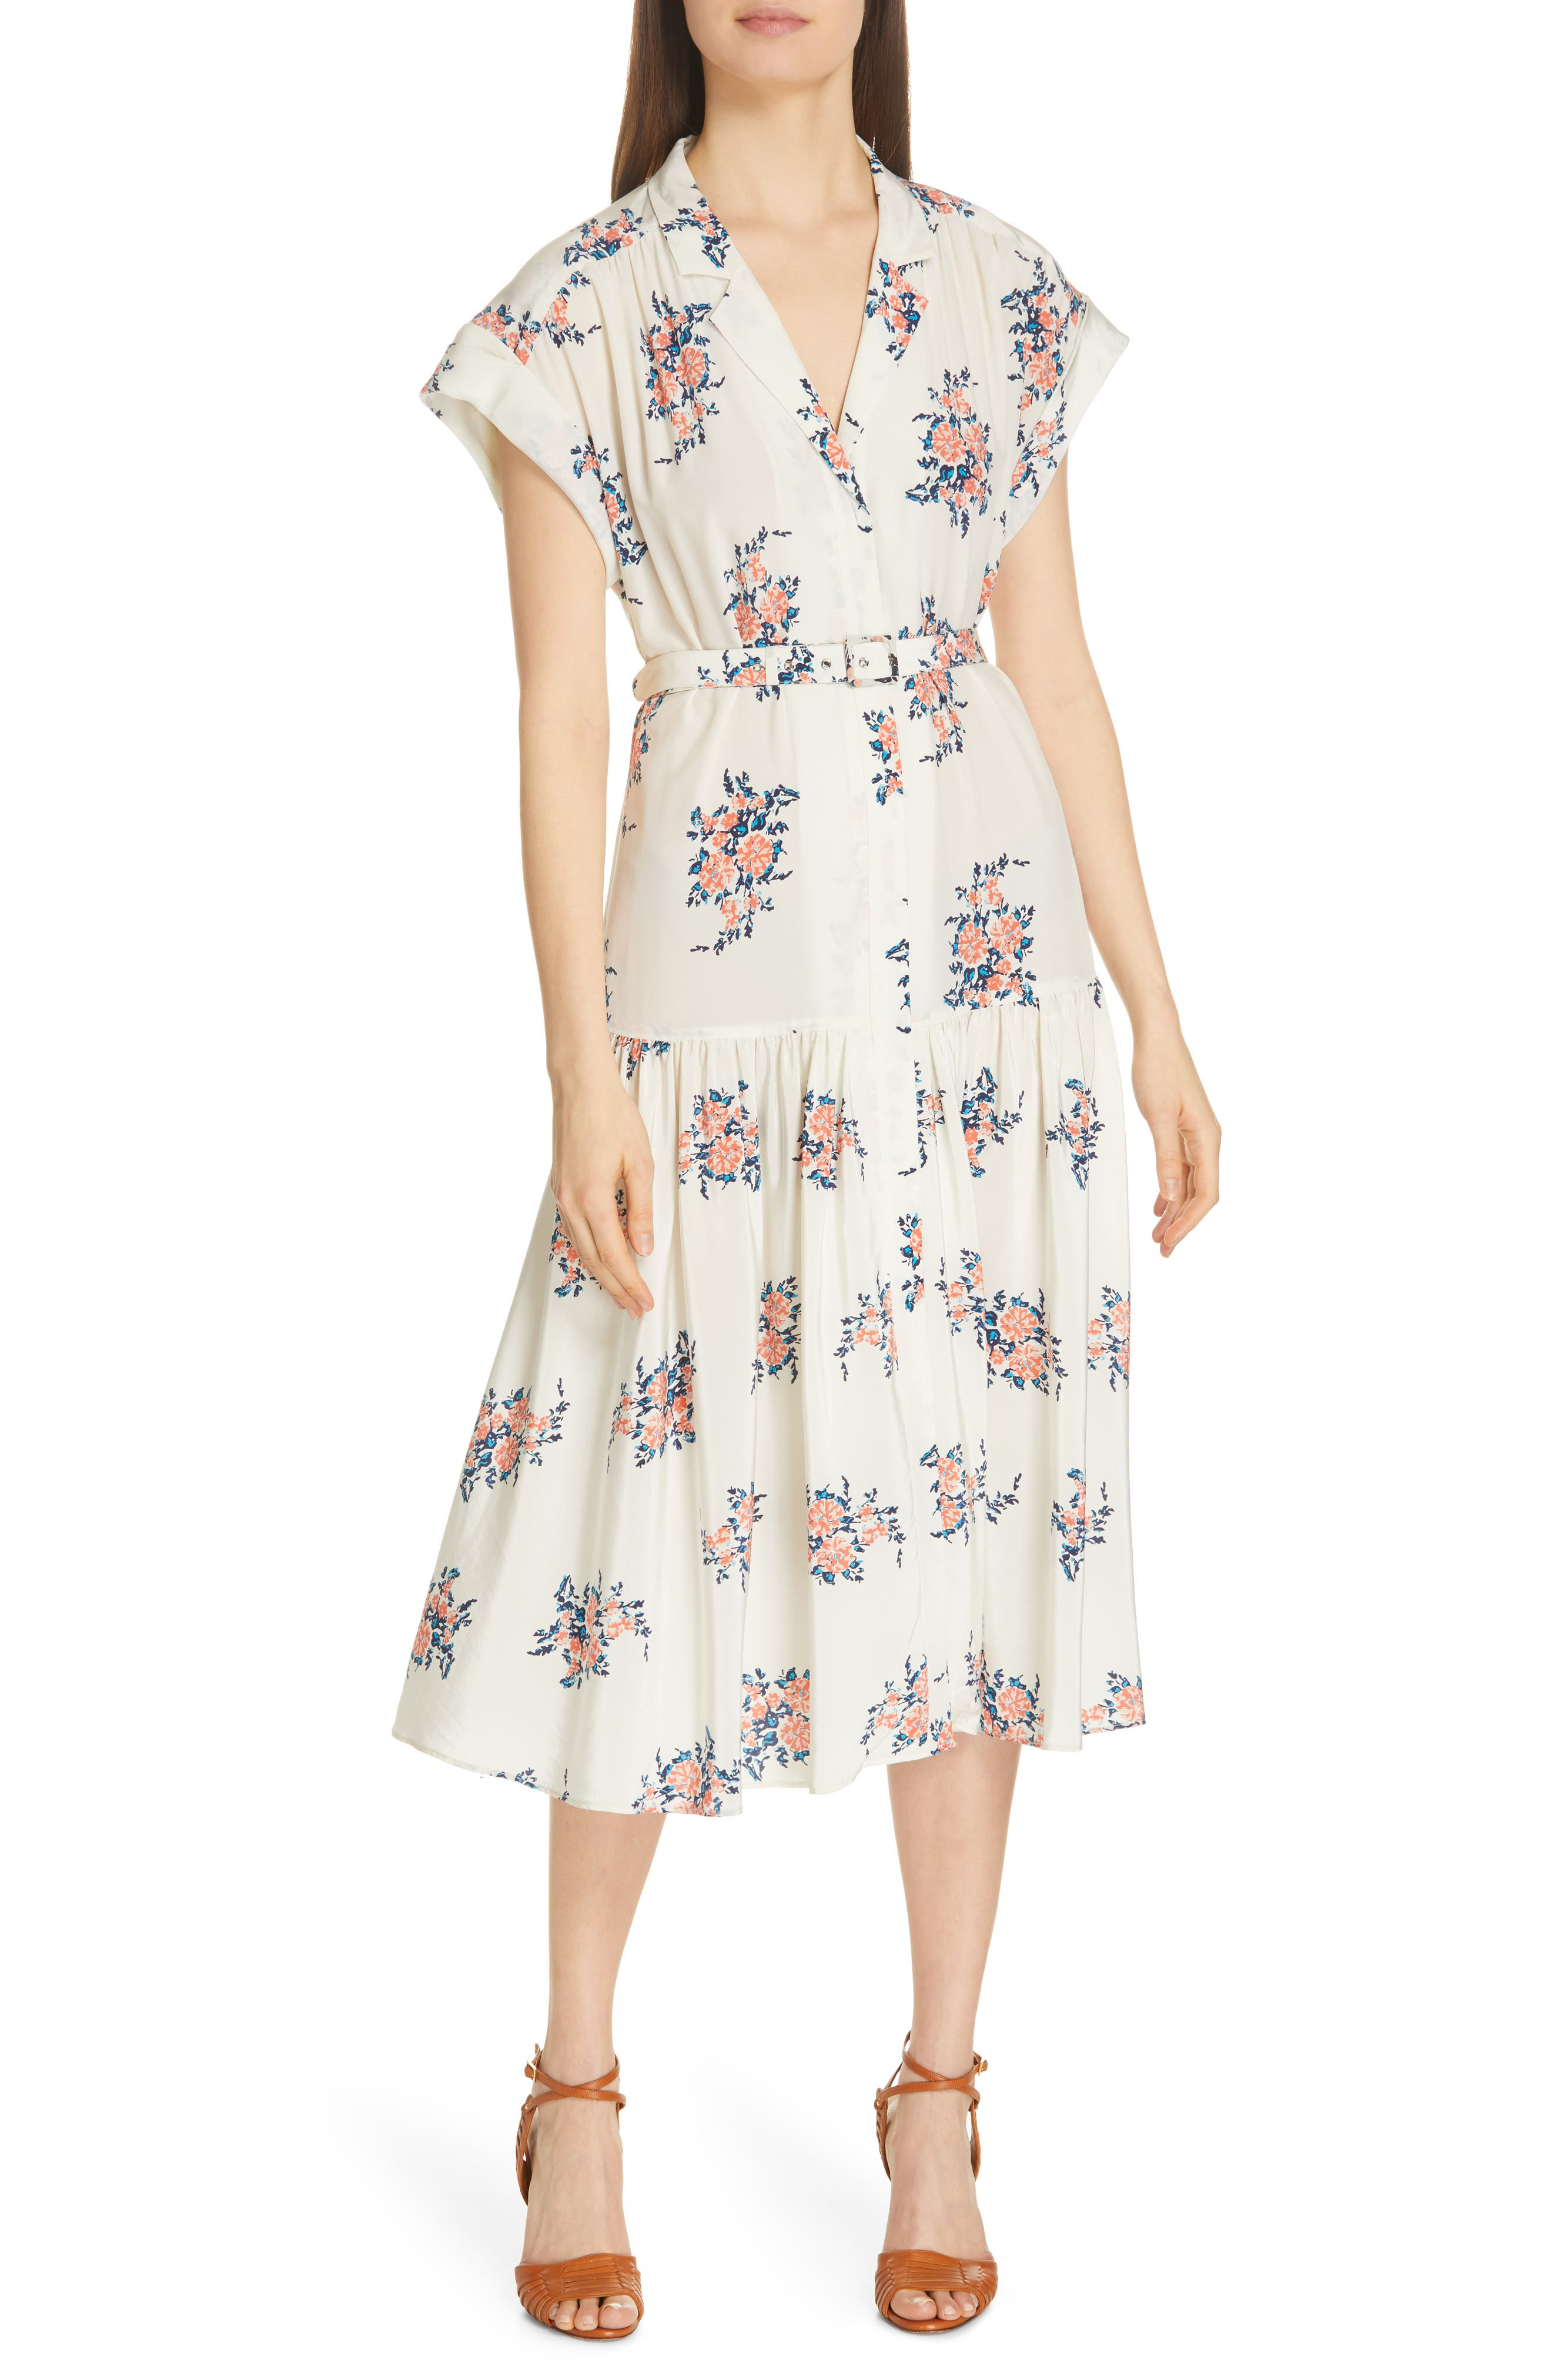 Retro Tiki Dress – Tropical, Hawaiian Dresses Womens Veronica Beard Meagan Print Silk Midi Dress Size 00 - White $695.00 AT vintagedancer.com